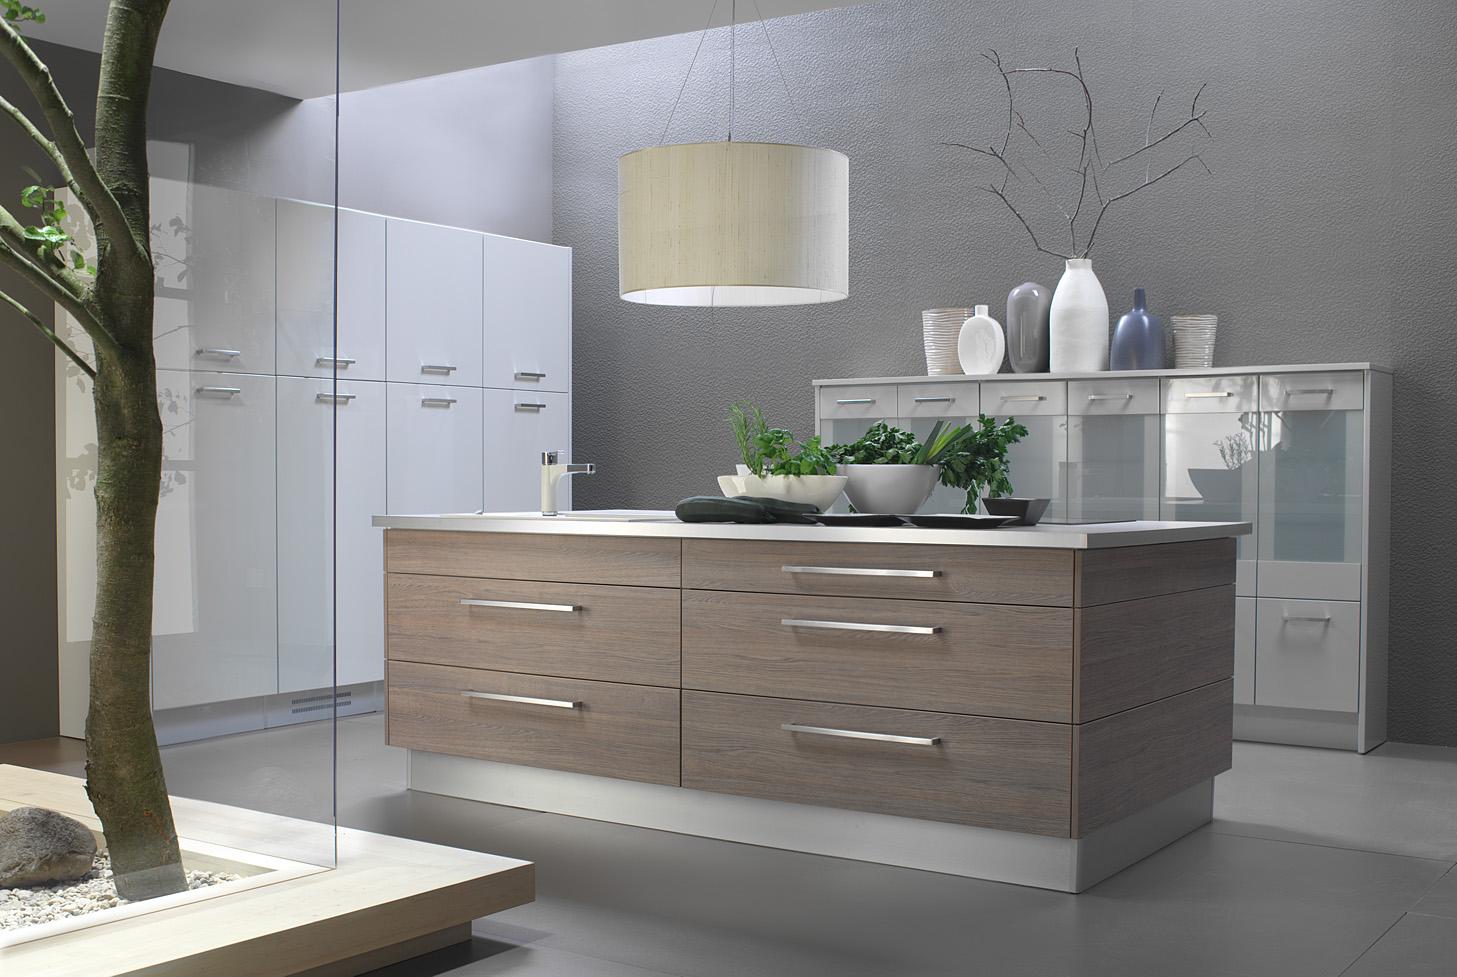 Laminate Kitchen Cabinets Design Ideas